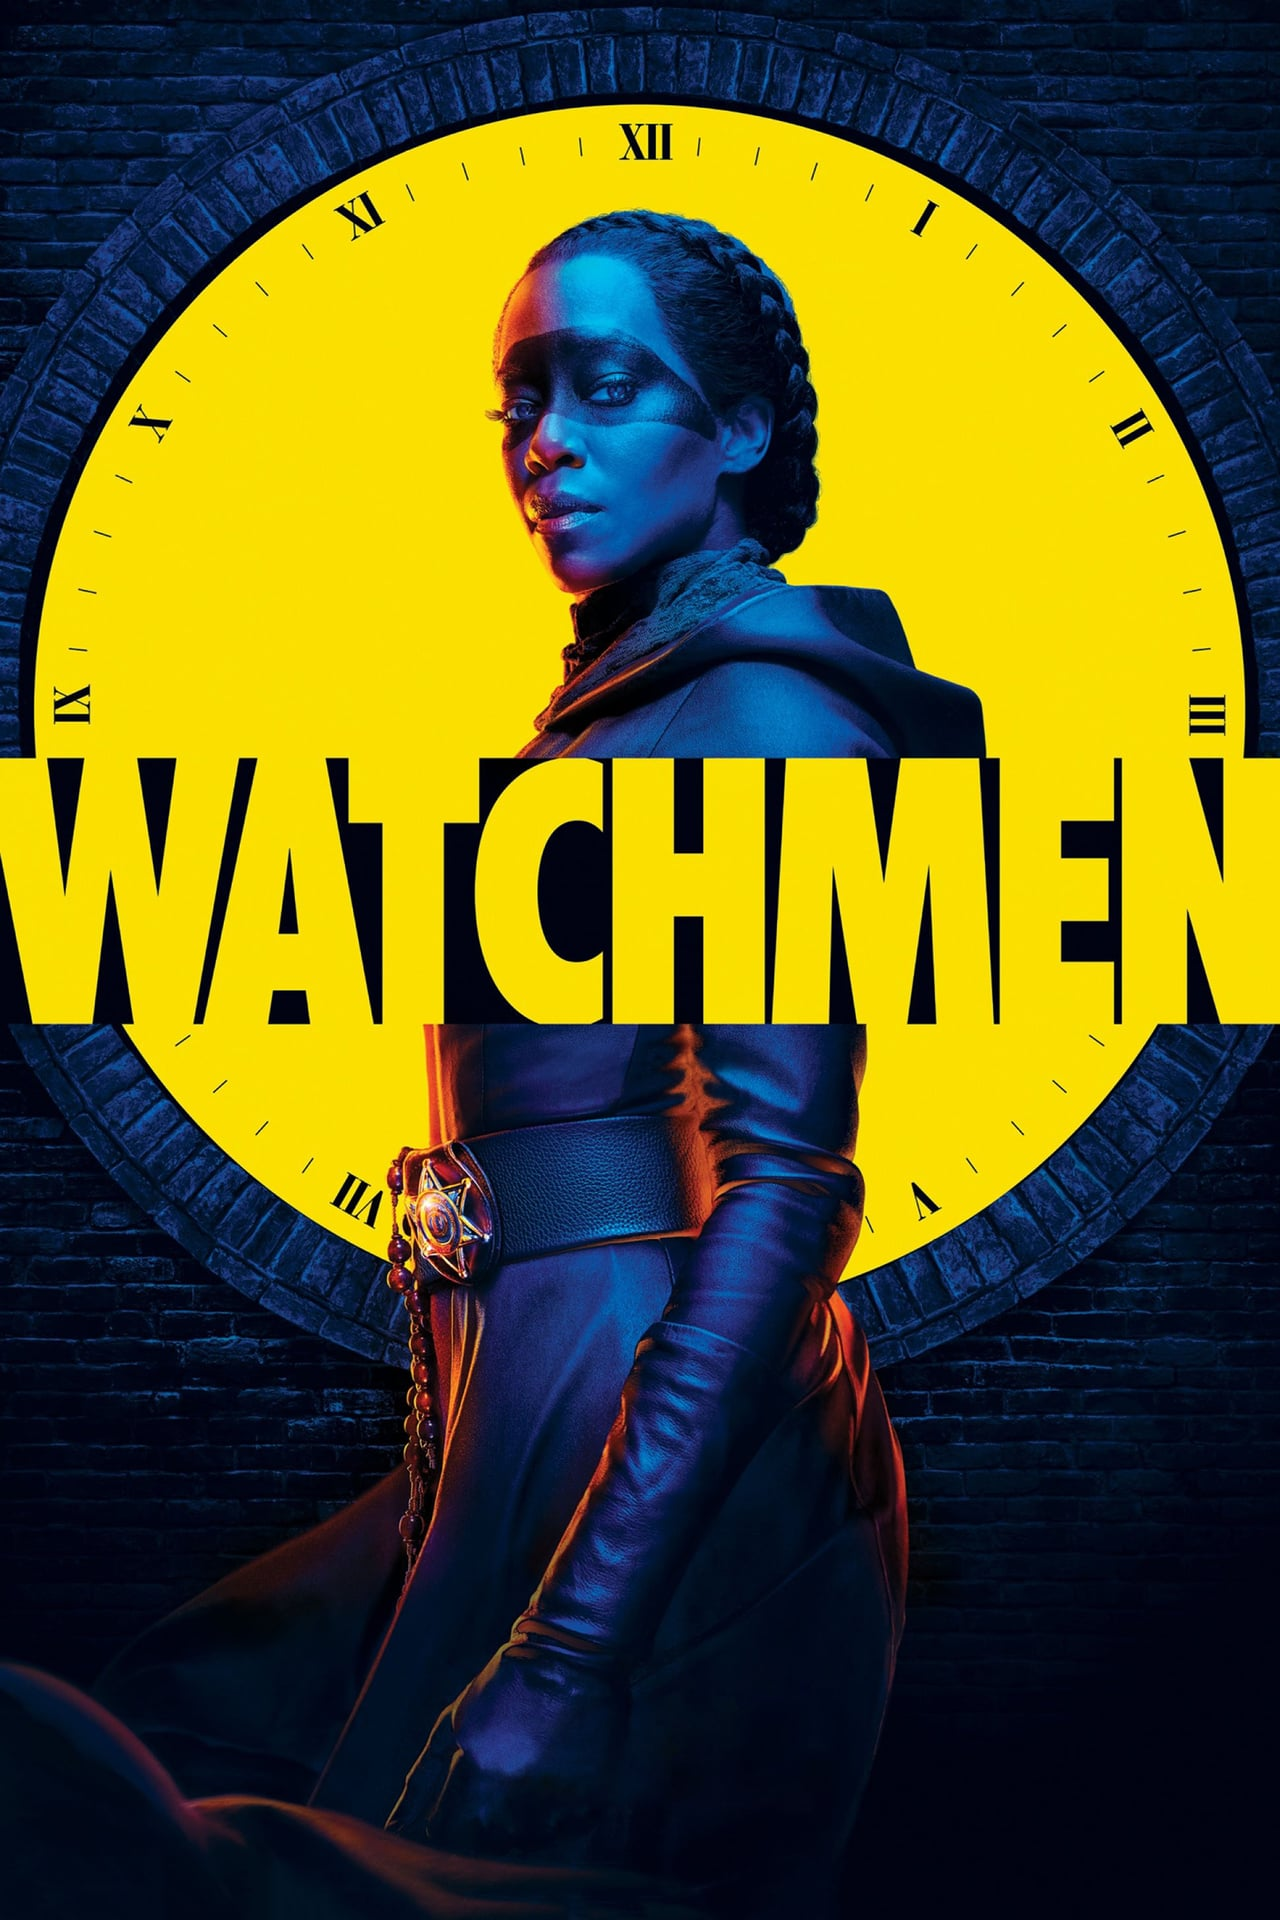 Watchmen.S01E04.SPANiSH.720p.WEB.h264-4FiRE